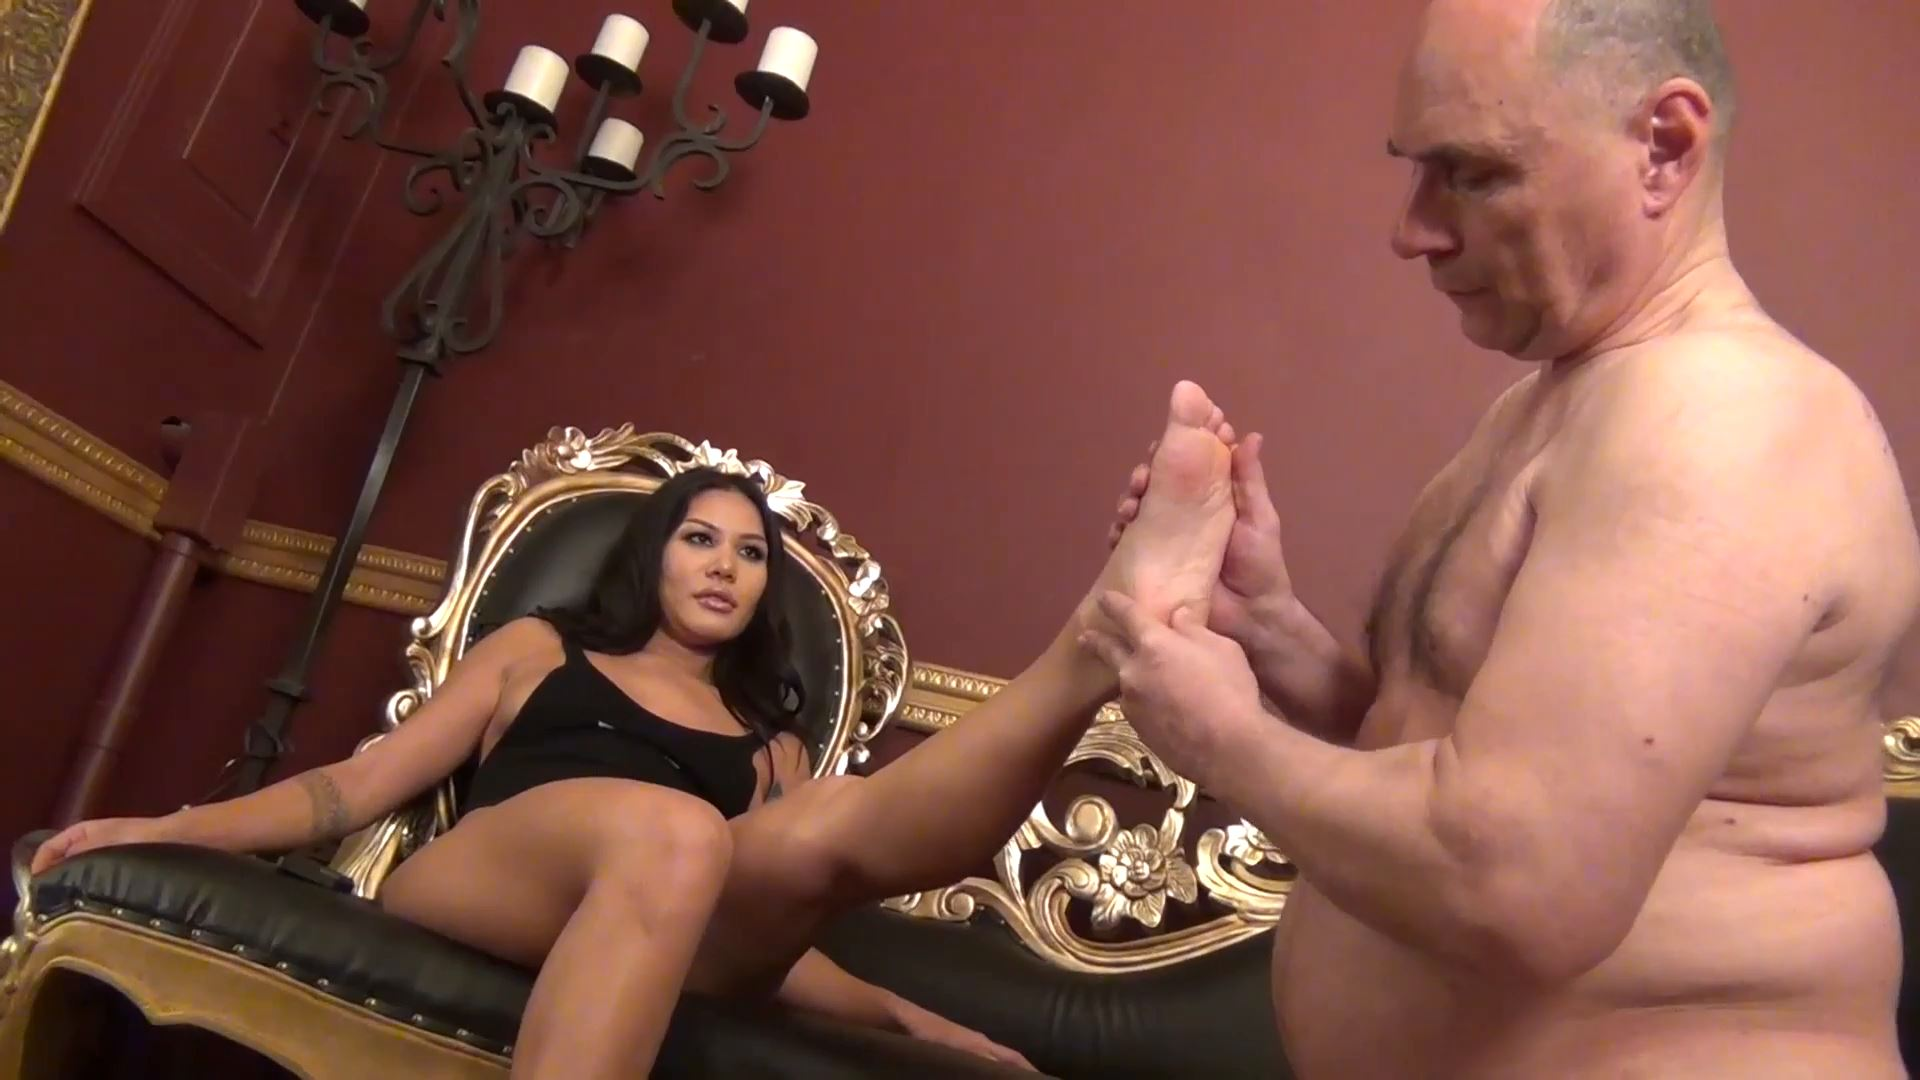 Goddess Mena In Scene: SWEAT LICKING LOSER! - ASIAN MEAN GIRLS - FULL HD/1080p/MP4